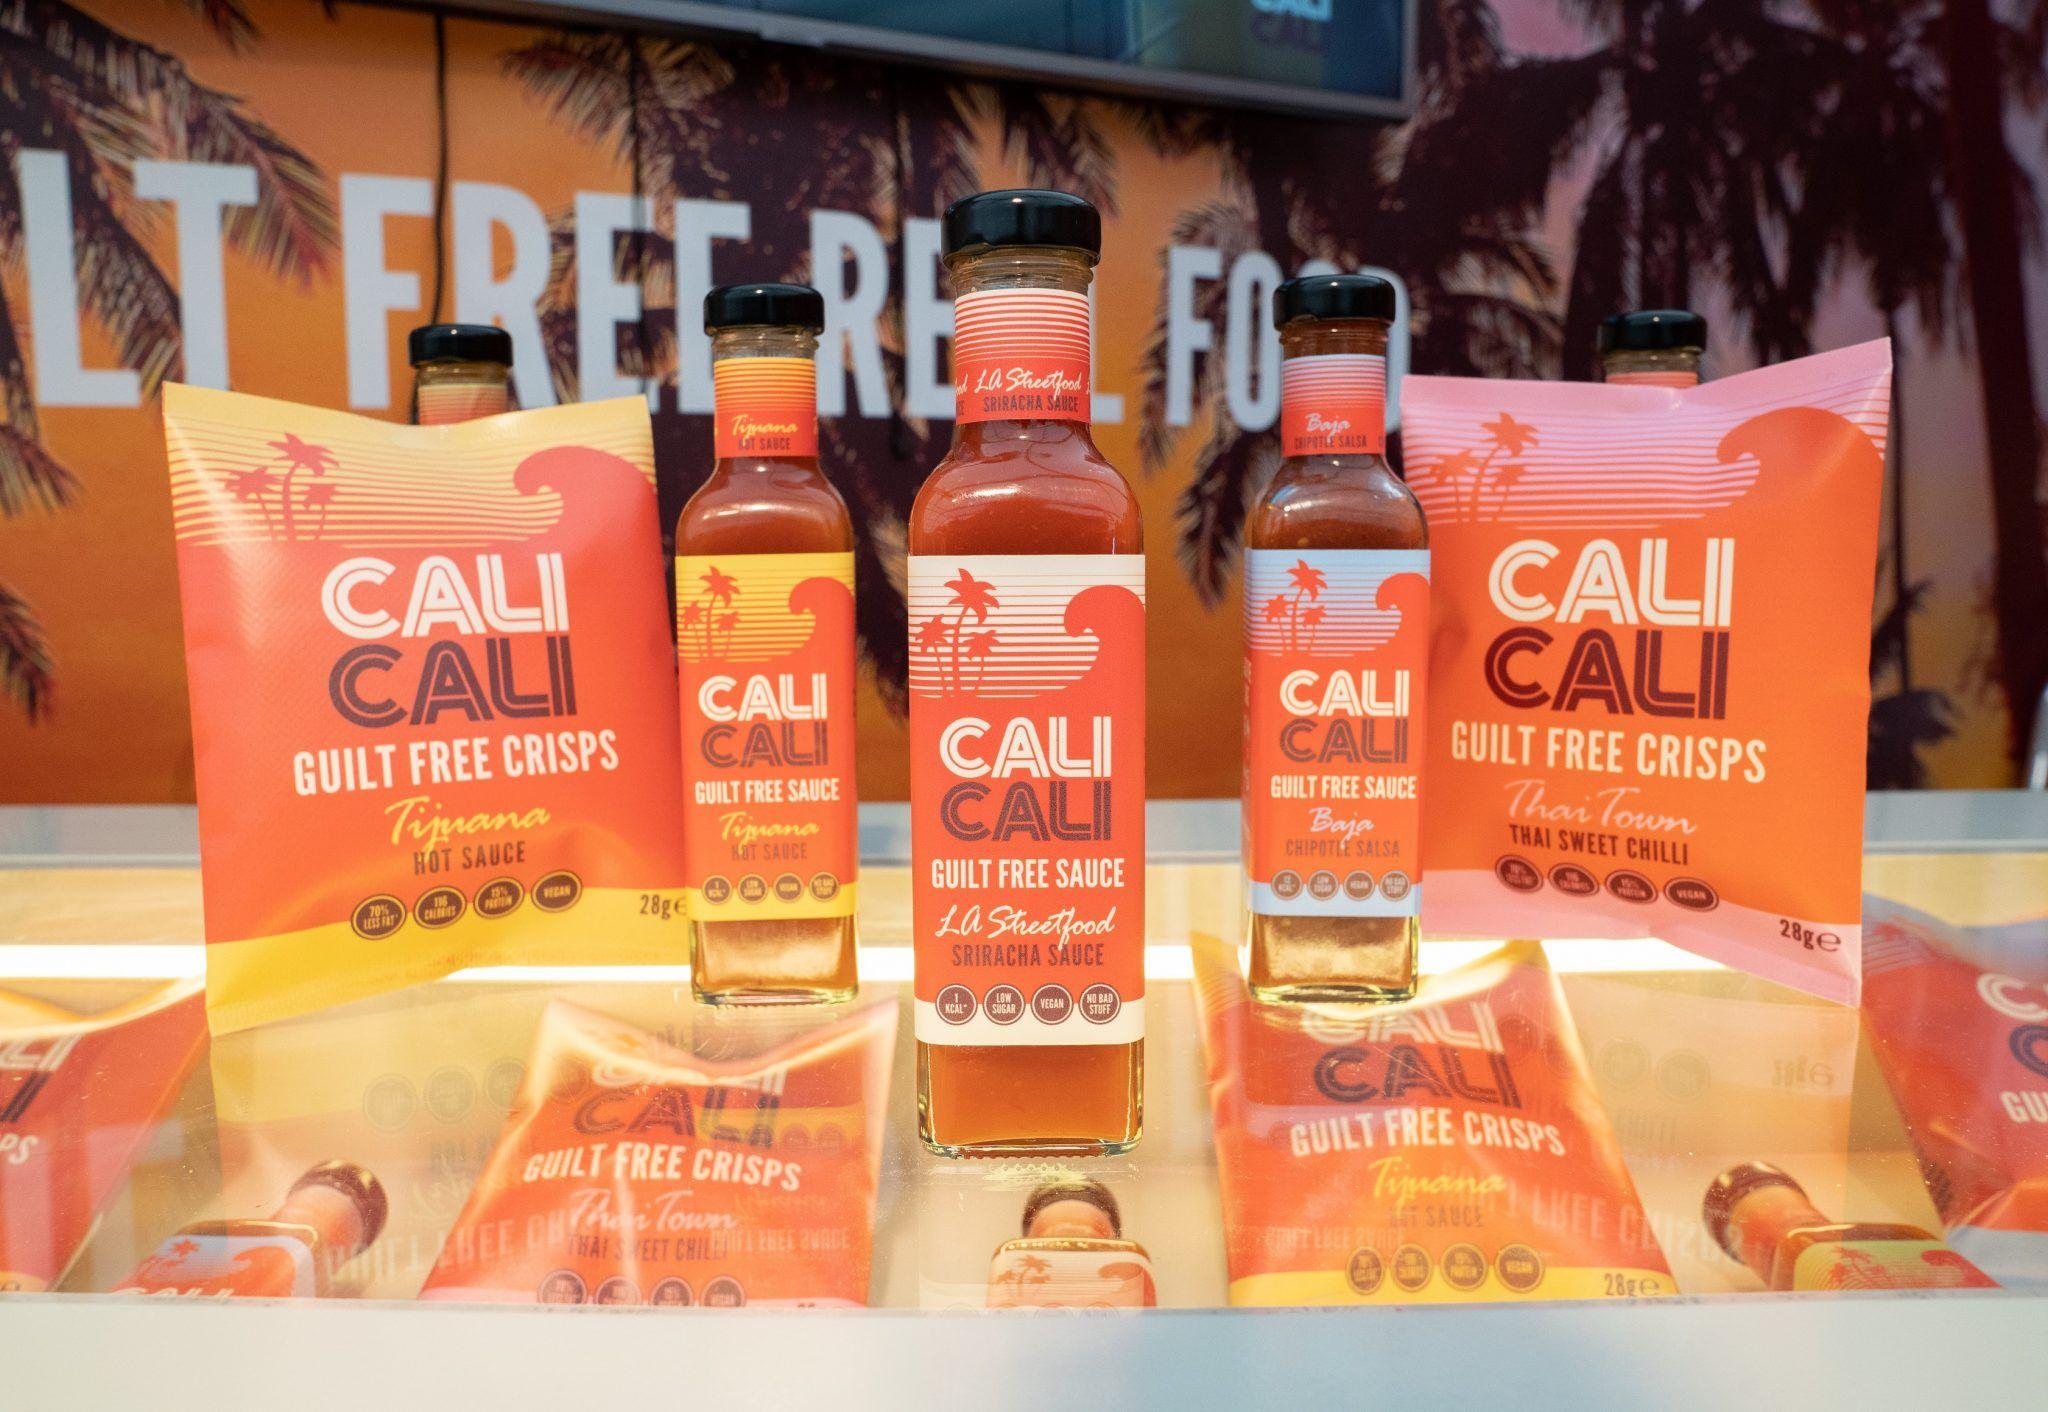 Cali Cali - Product Range